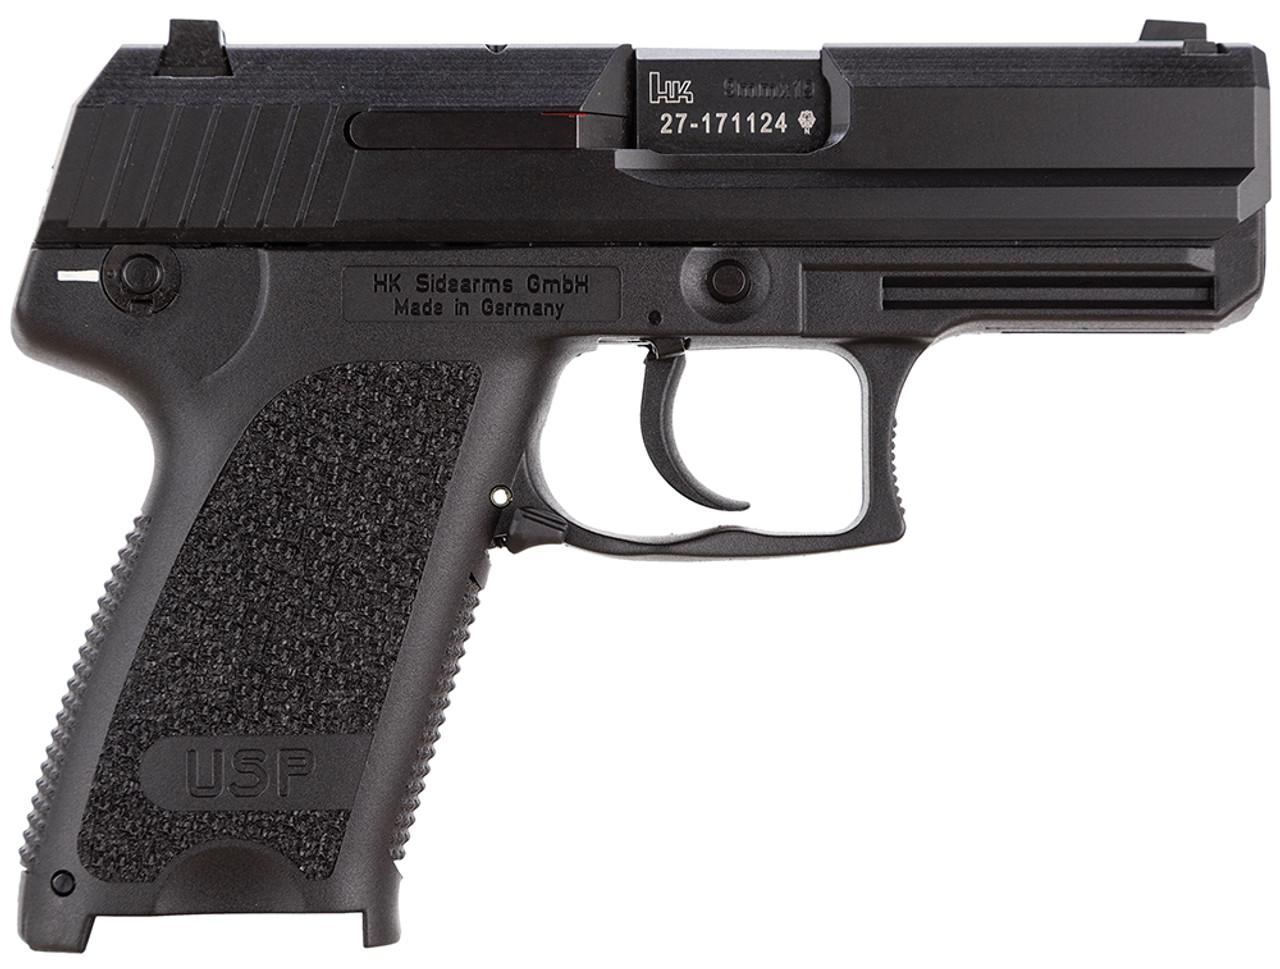 "HK USP 9 C Compact V1 3.6"" CALIFORNIA LEGAL - 9mm"